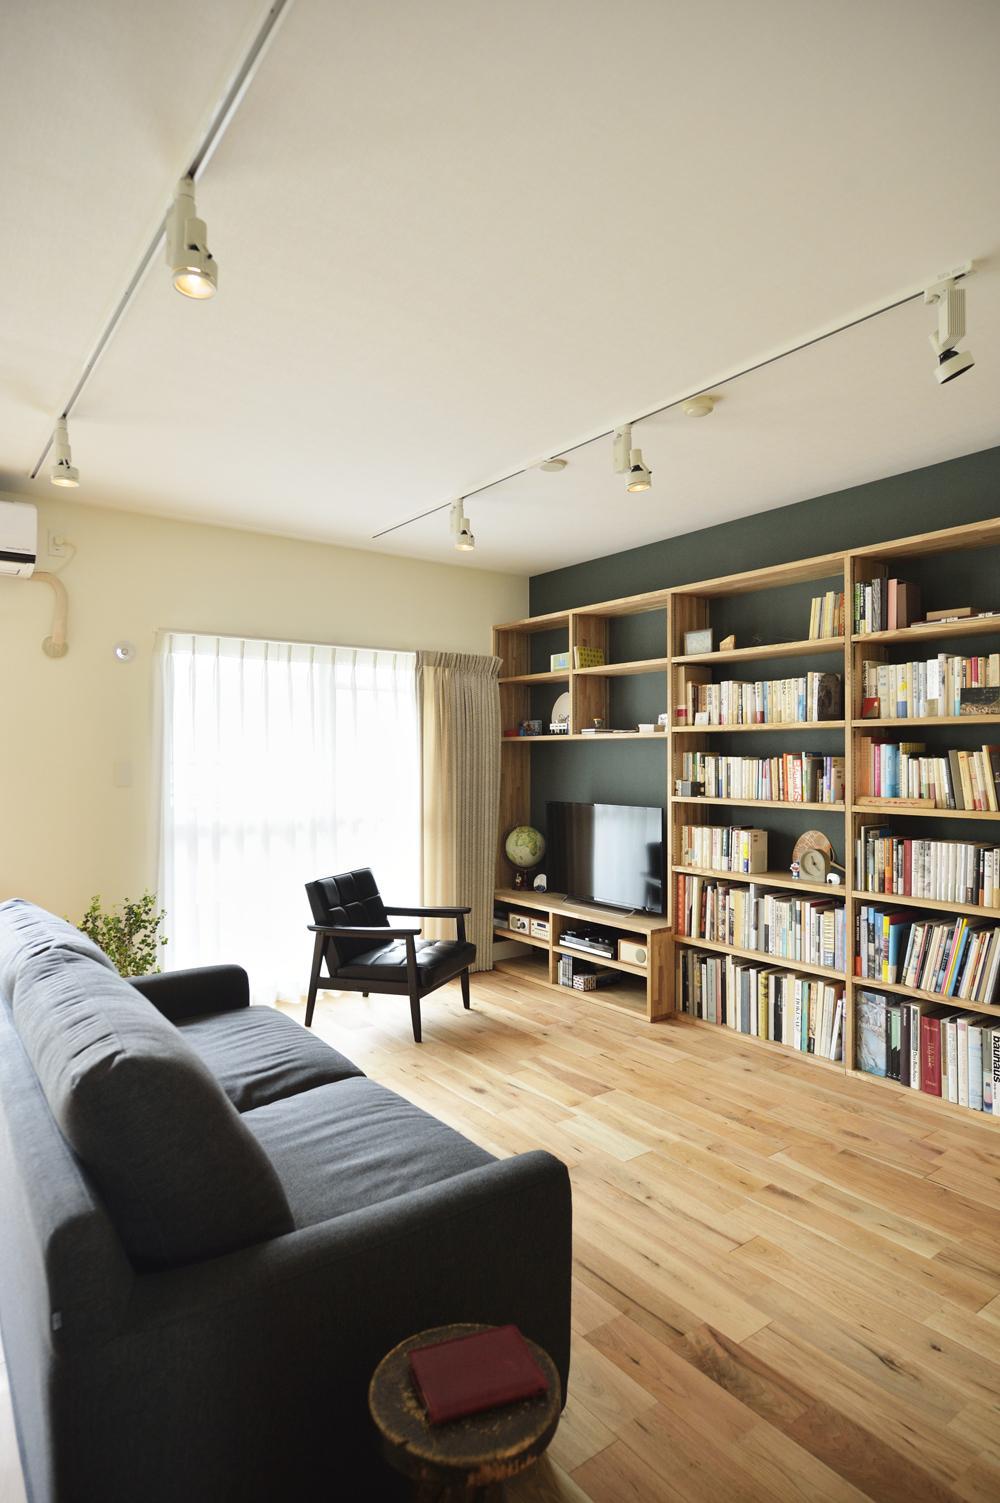 K邸・暮しを彩る収納のある家の部屋 リビング-テレビボード兼壁面収納